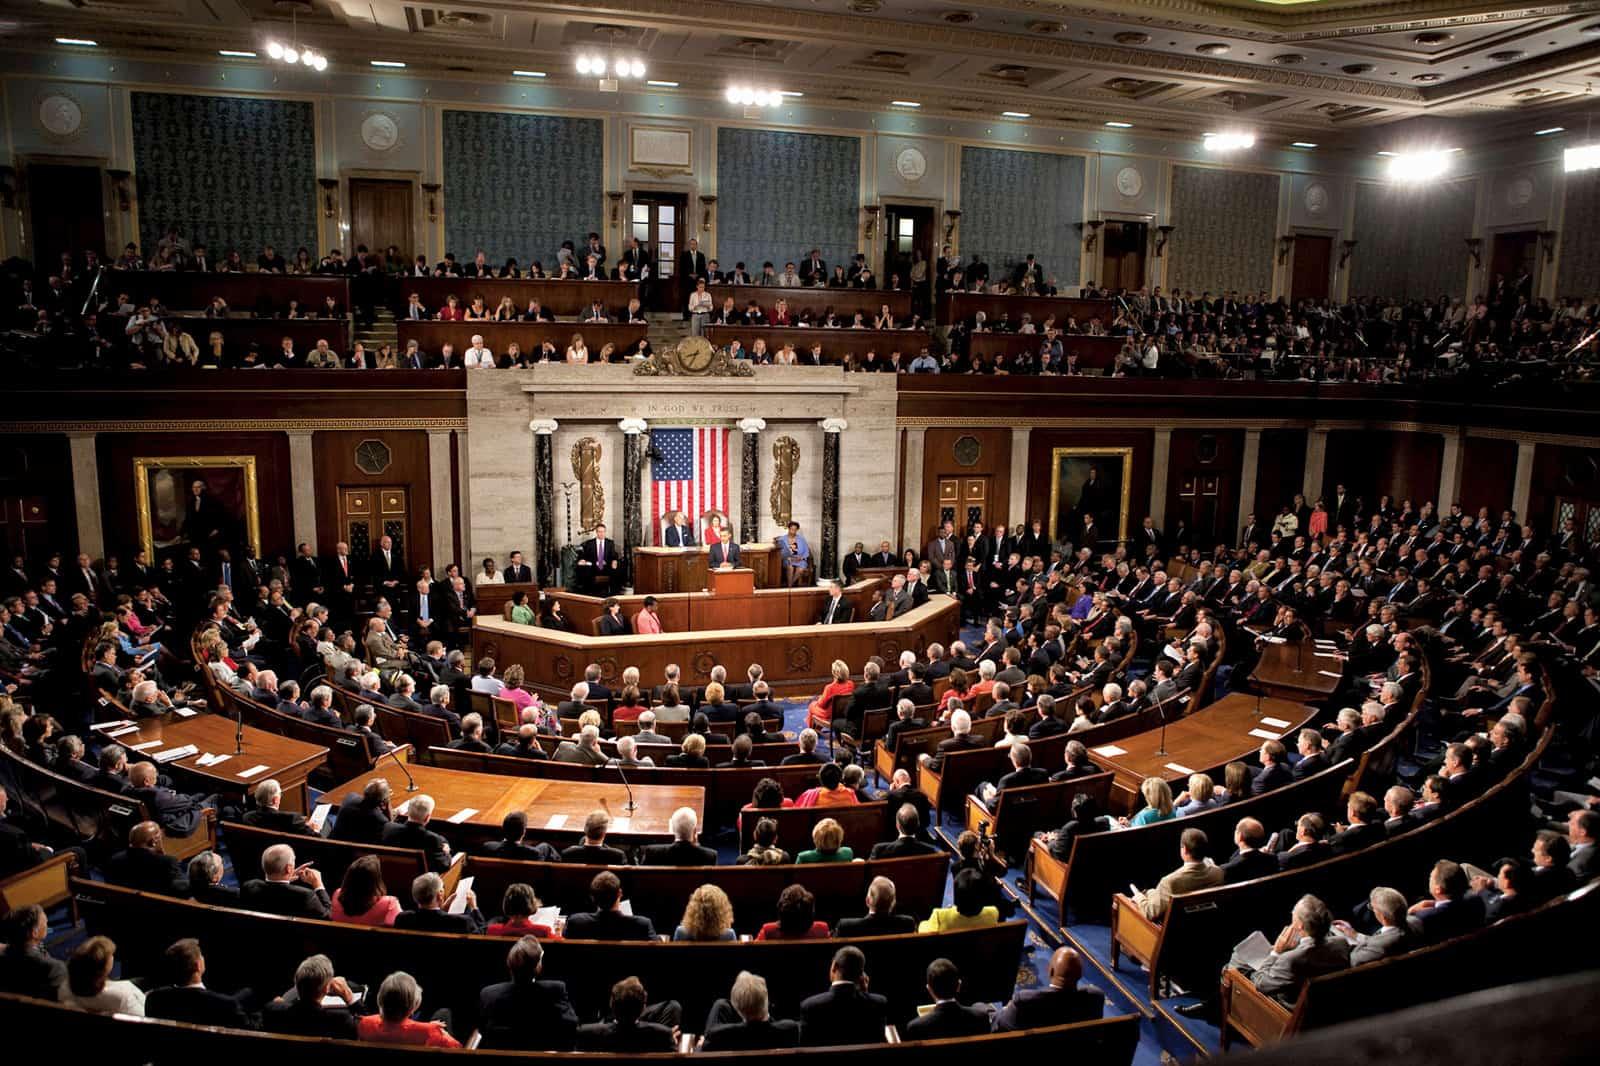 Three Gun Control Bills Ready for Floor Vote